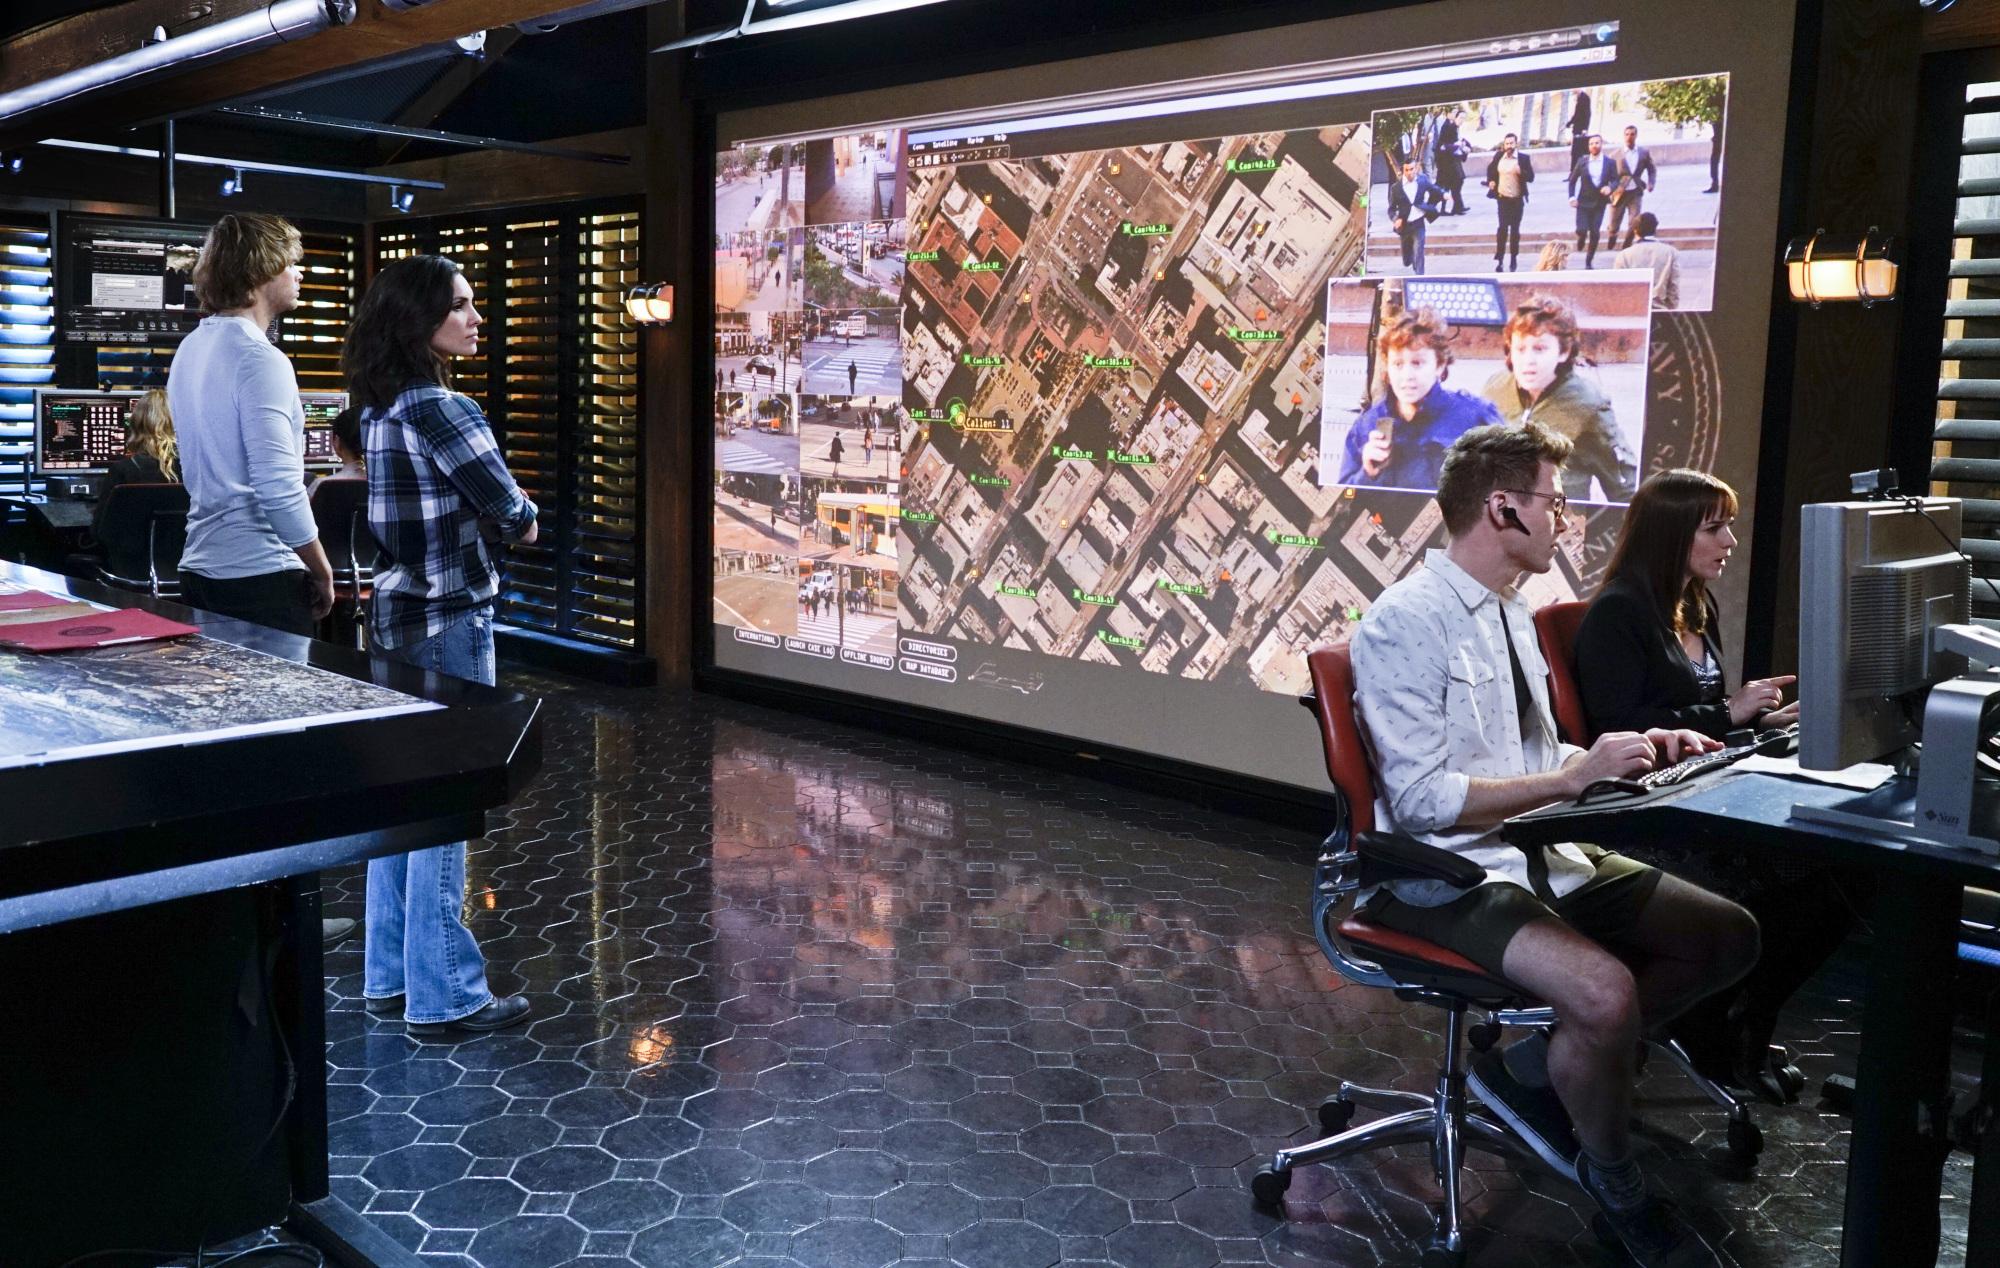 Eric Christian Olsen as LAPD Liaison Marty Deeks, Daniela Ruah as Special Agent Kensi Blye, Barrett Foa as Tech Operator Eric Beale, and Renée Felice Smith as Intelligence Analyst Nell Jones